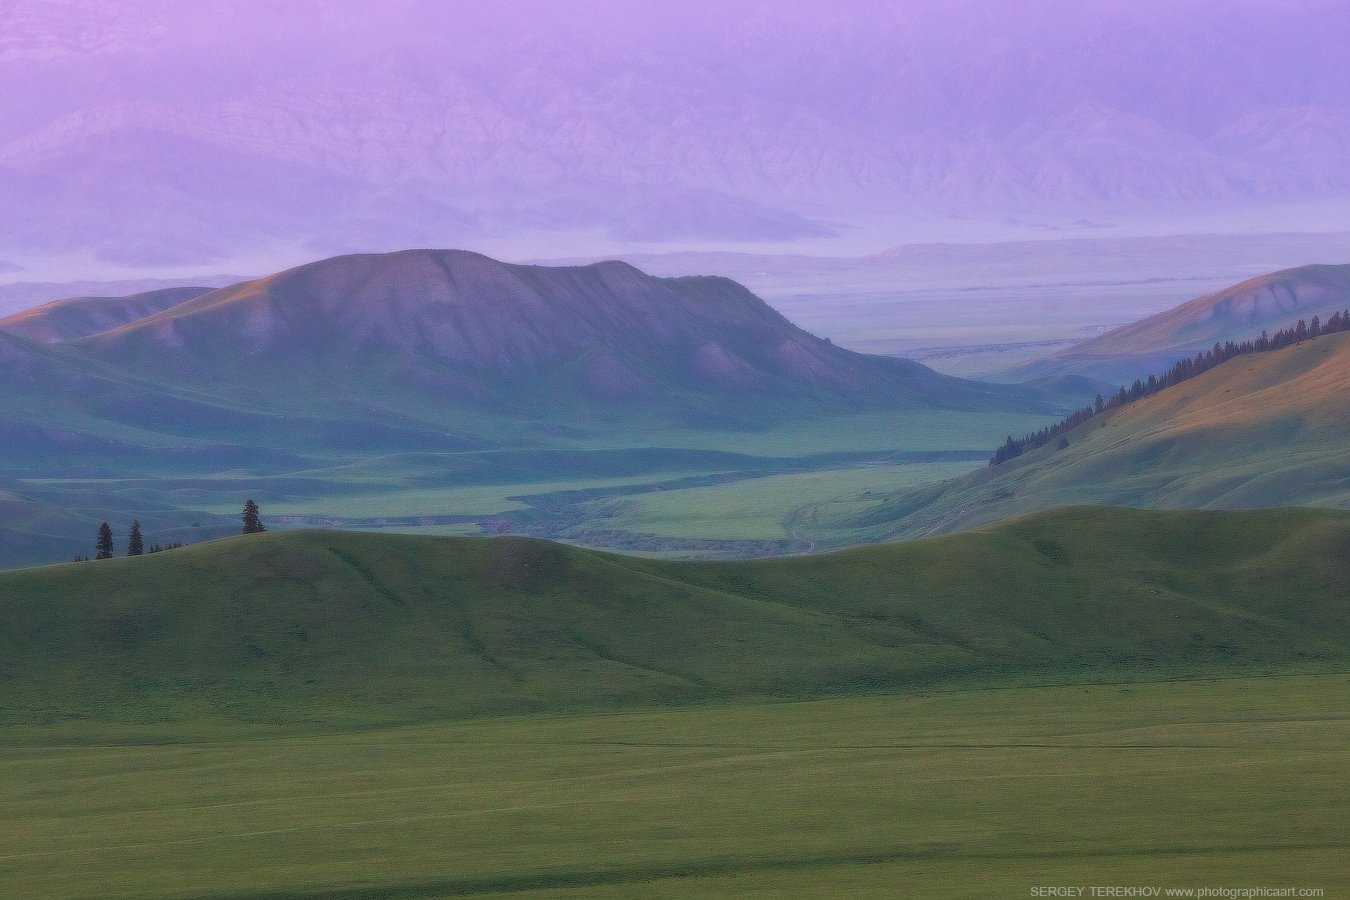 Река Текес, Река Шалкоде, Сергей Терехов